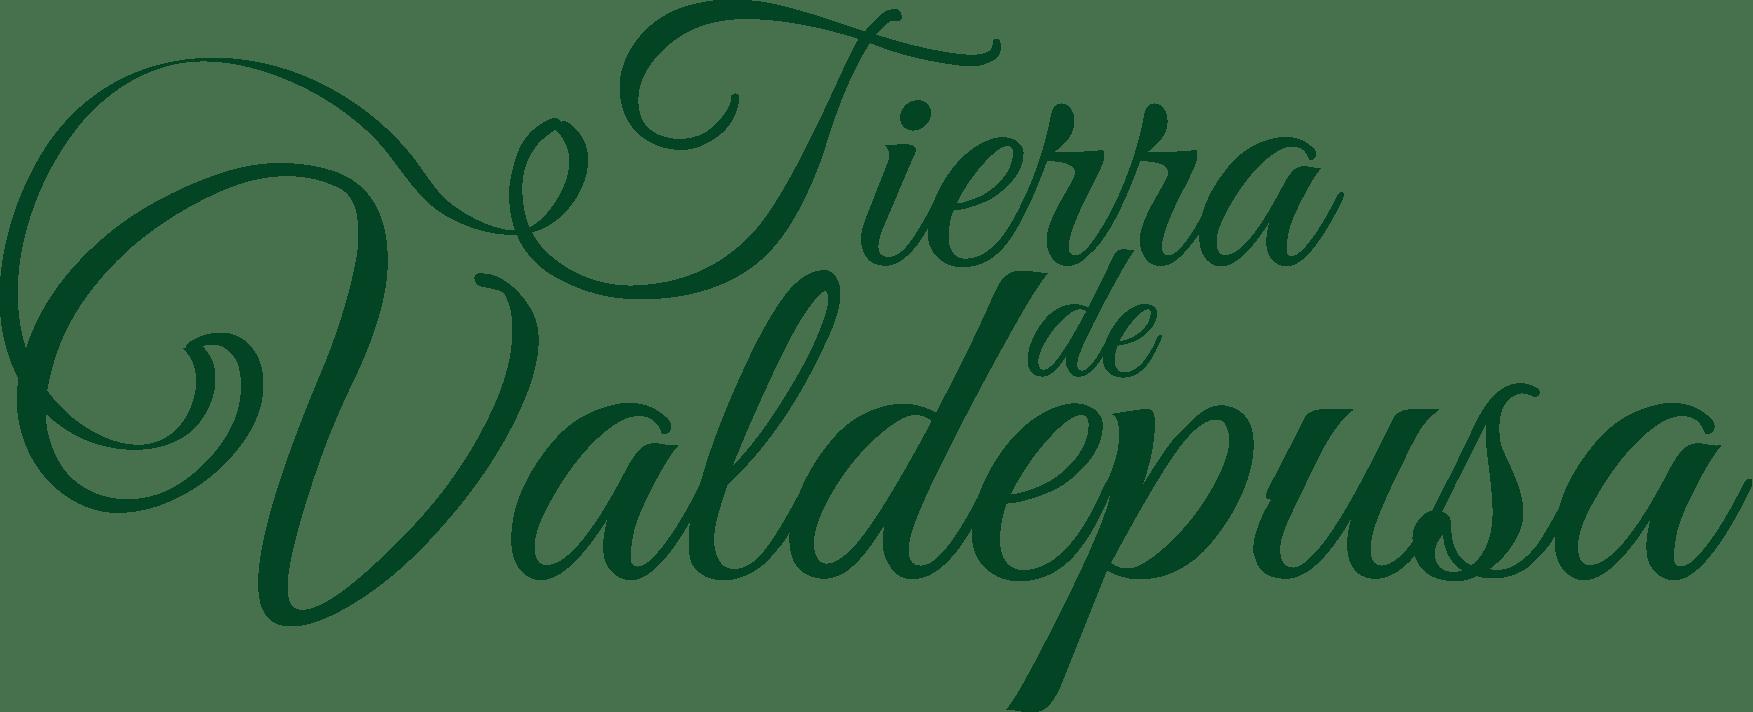 Tierra de Valdepusa San Martín de Pusa